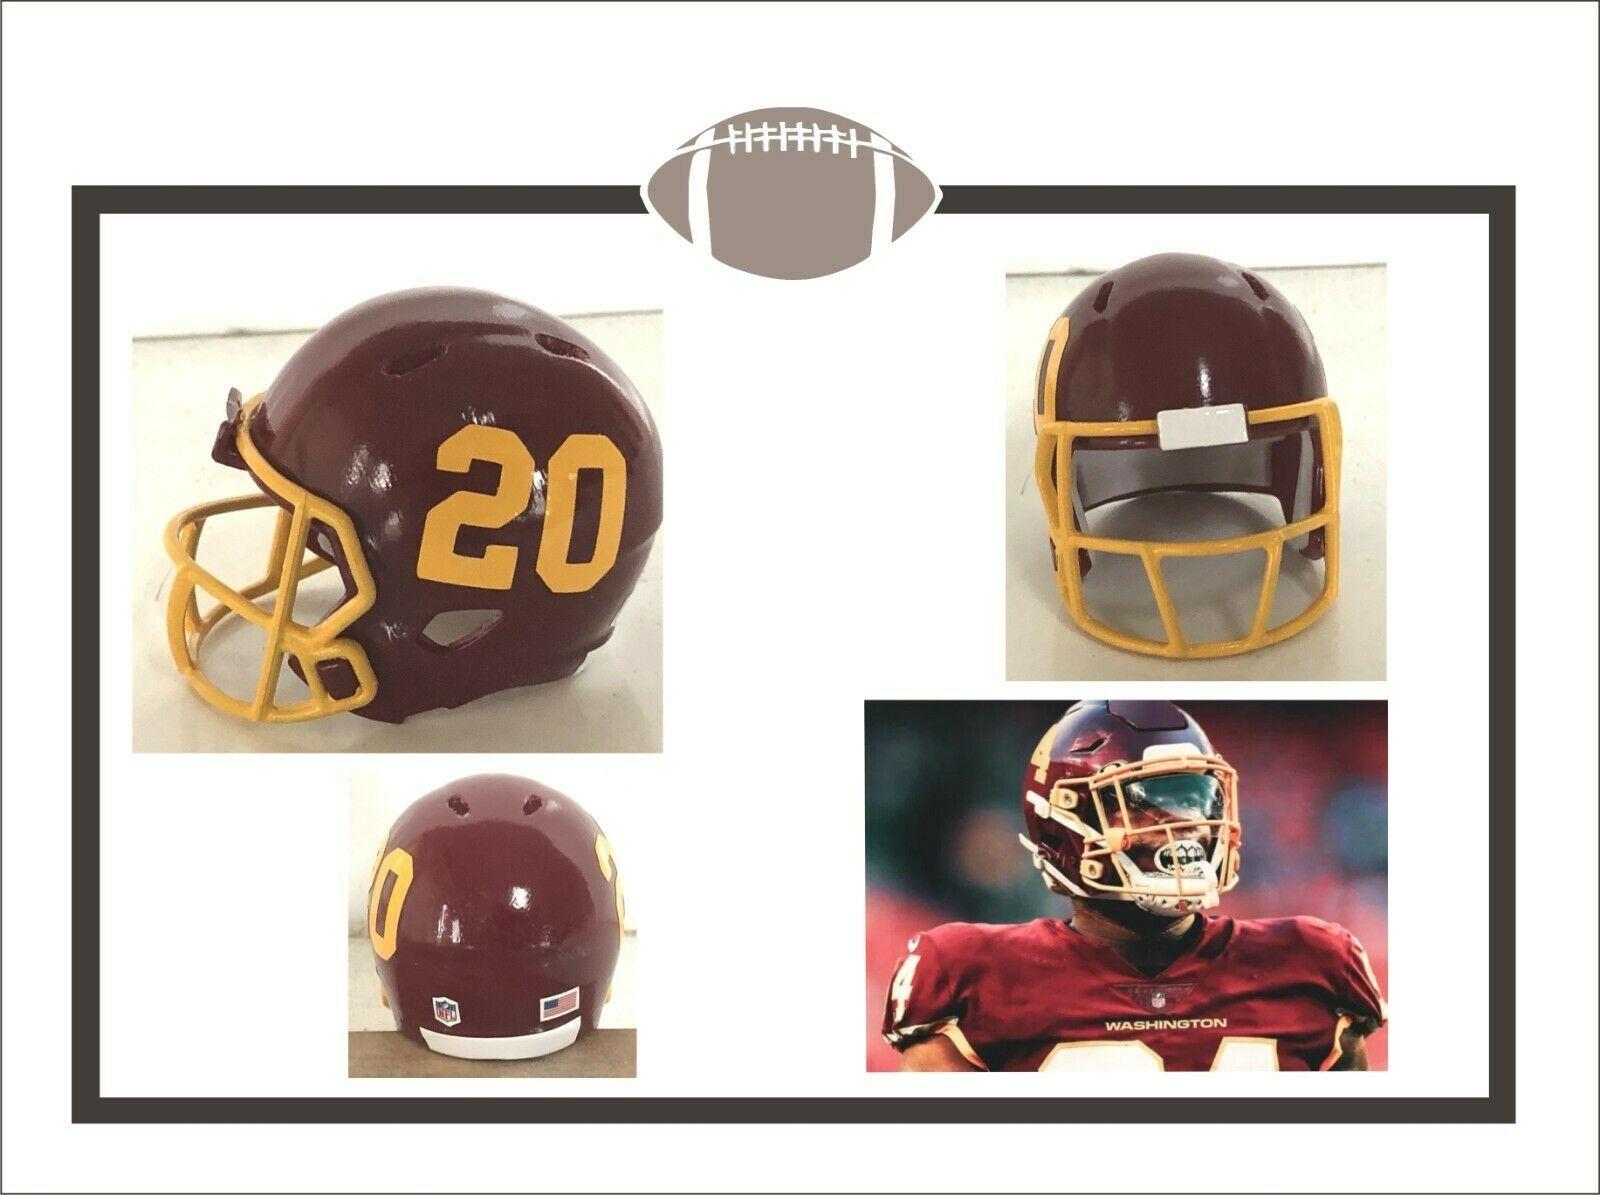 Custom New For 2020 Nfl Washington Football Team 2 Pocket Pro Football Helmet Ebay In 2020 Football Helmets Washington Football Football Team